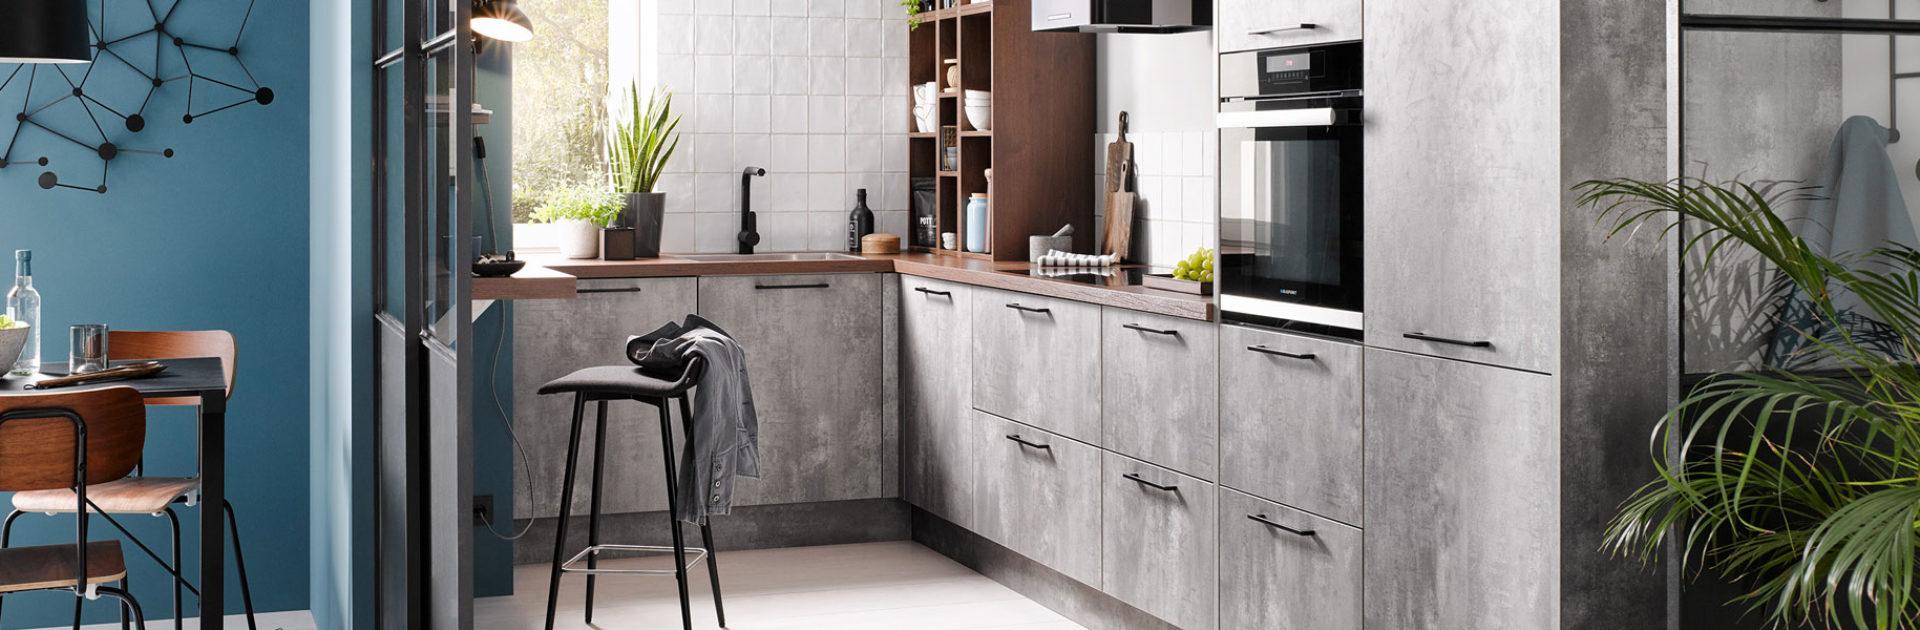 Keuken in betonlook | Keukentrends 2020 | Satink Keukens